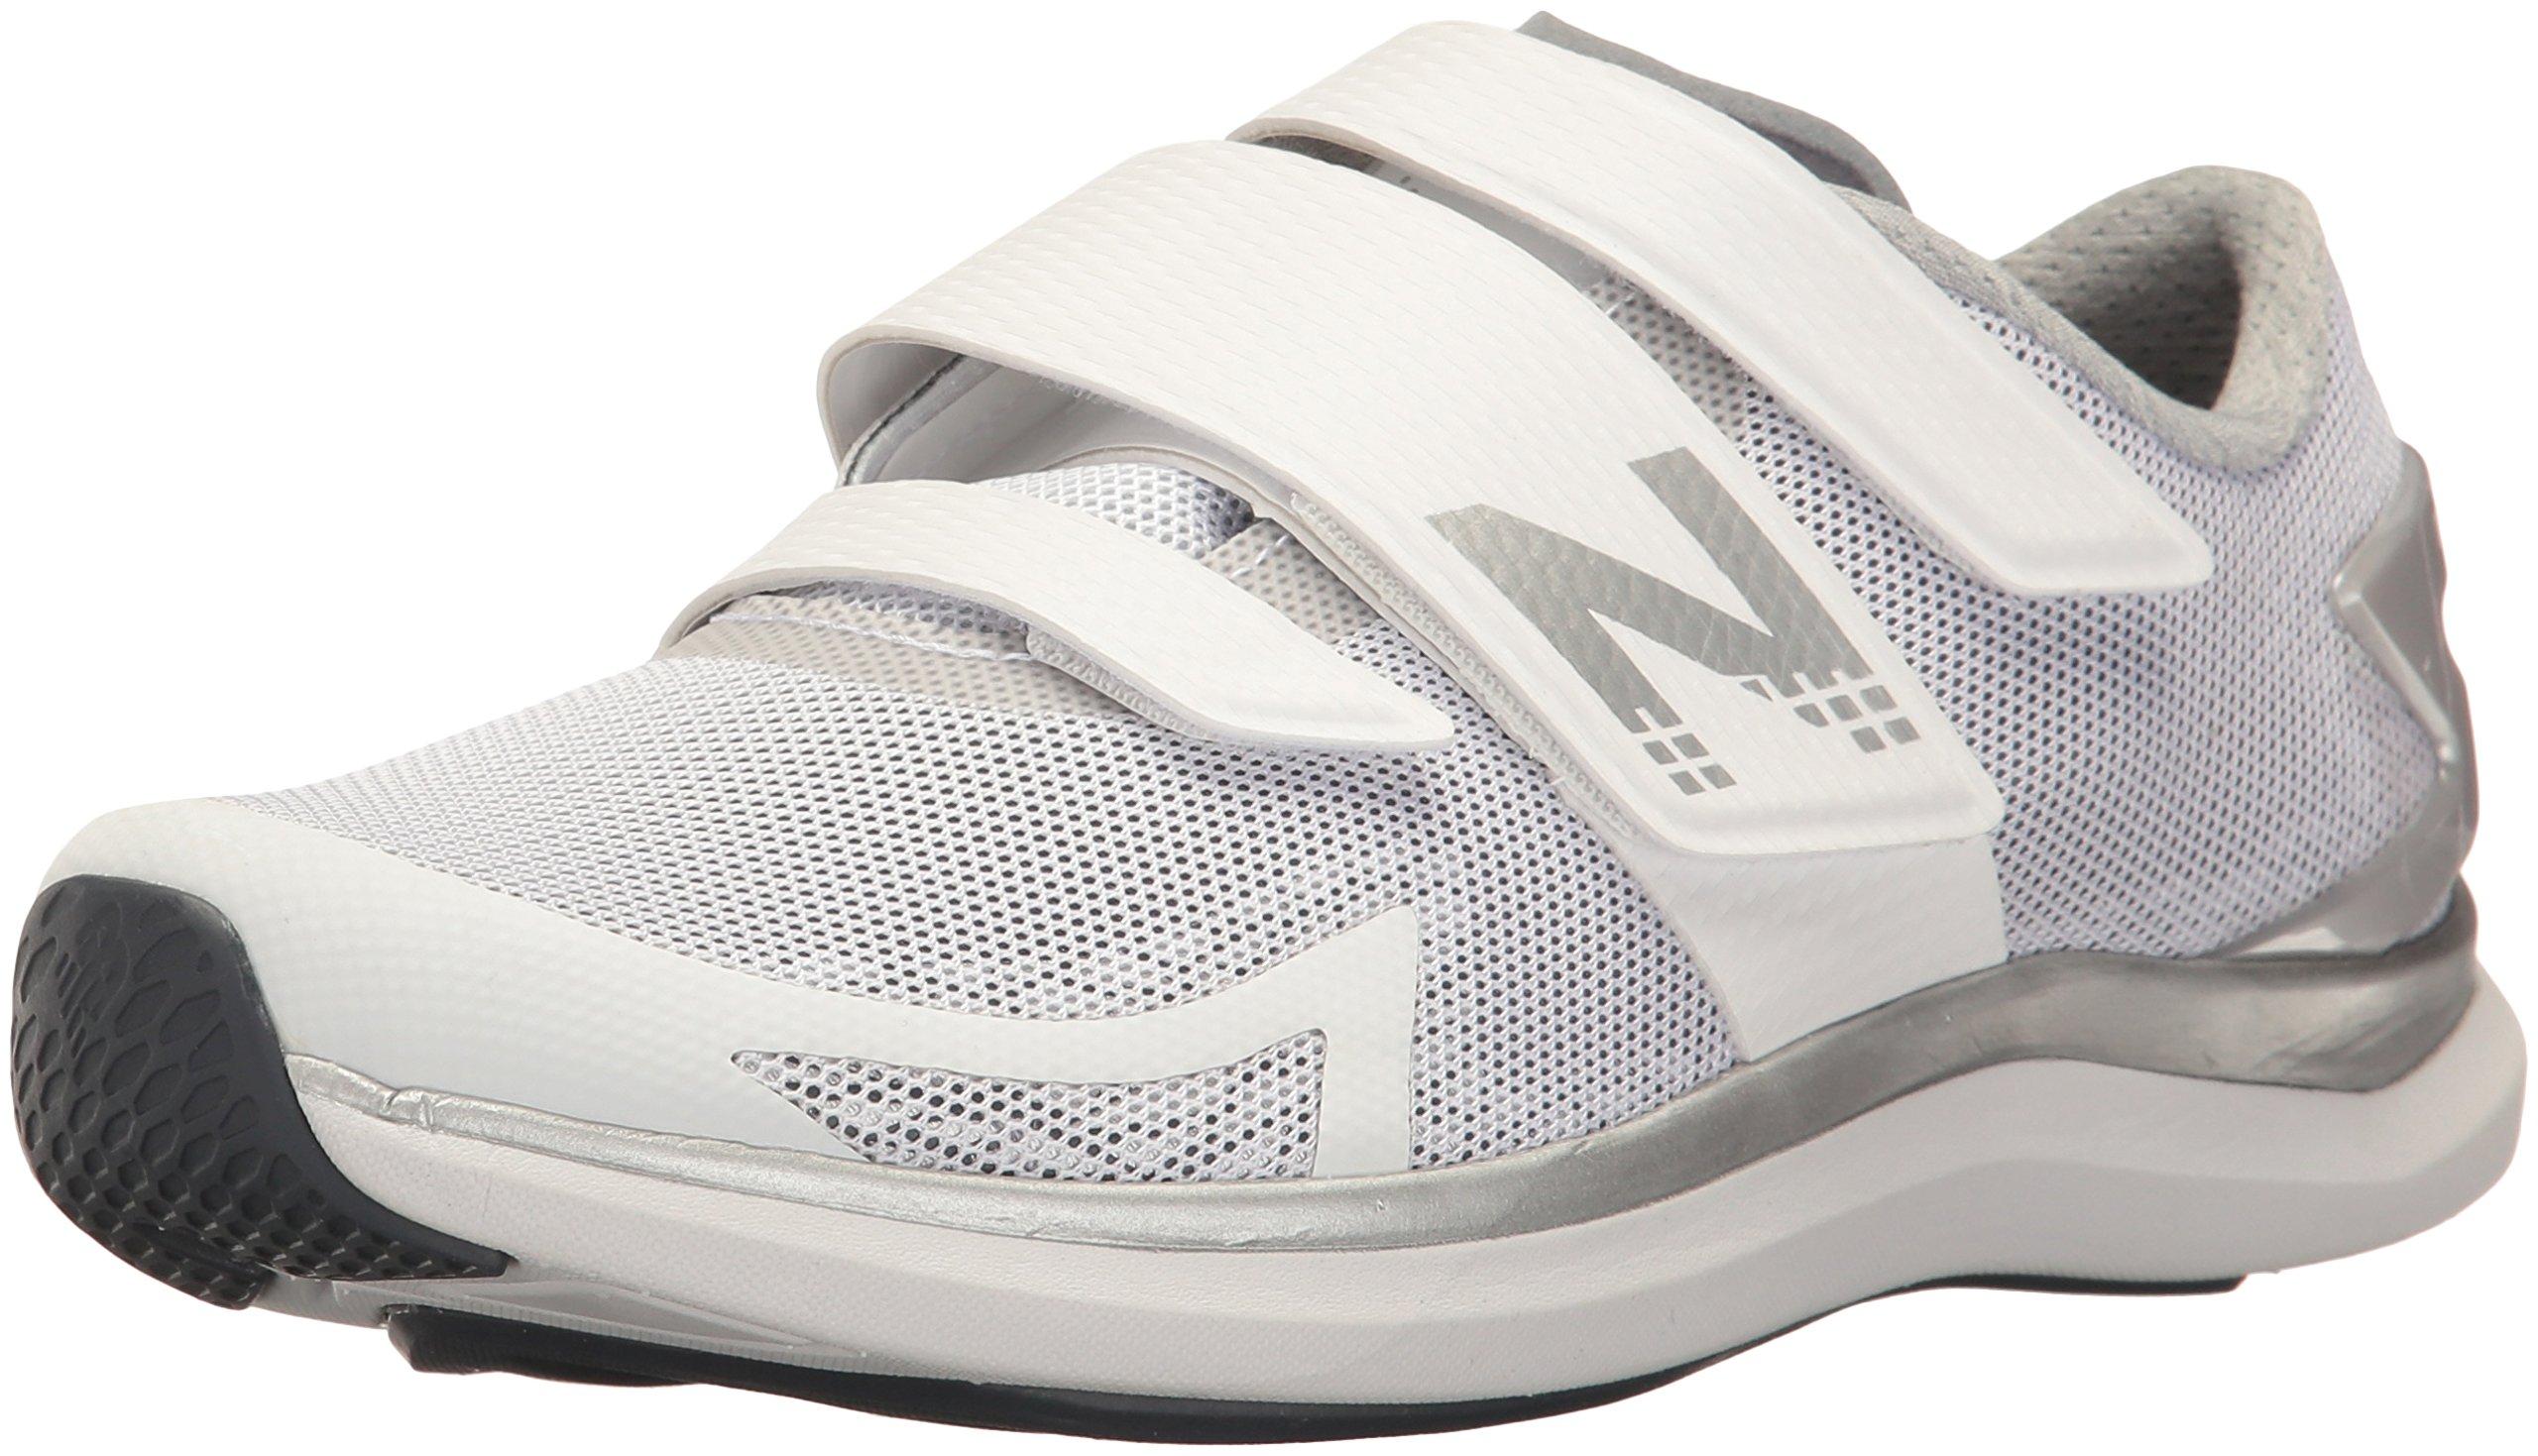 New Balance Women's 09v1 Training Shoe, White/Grey, 12 B US